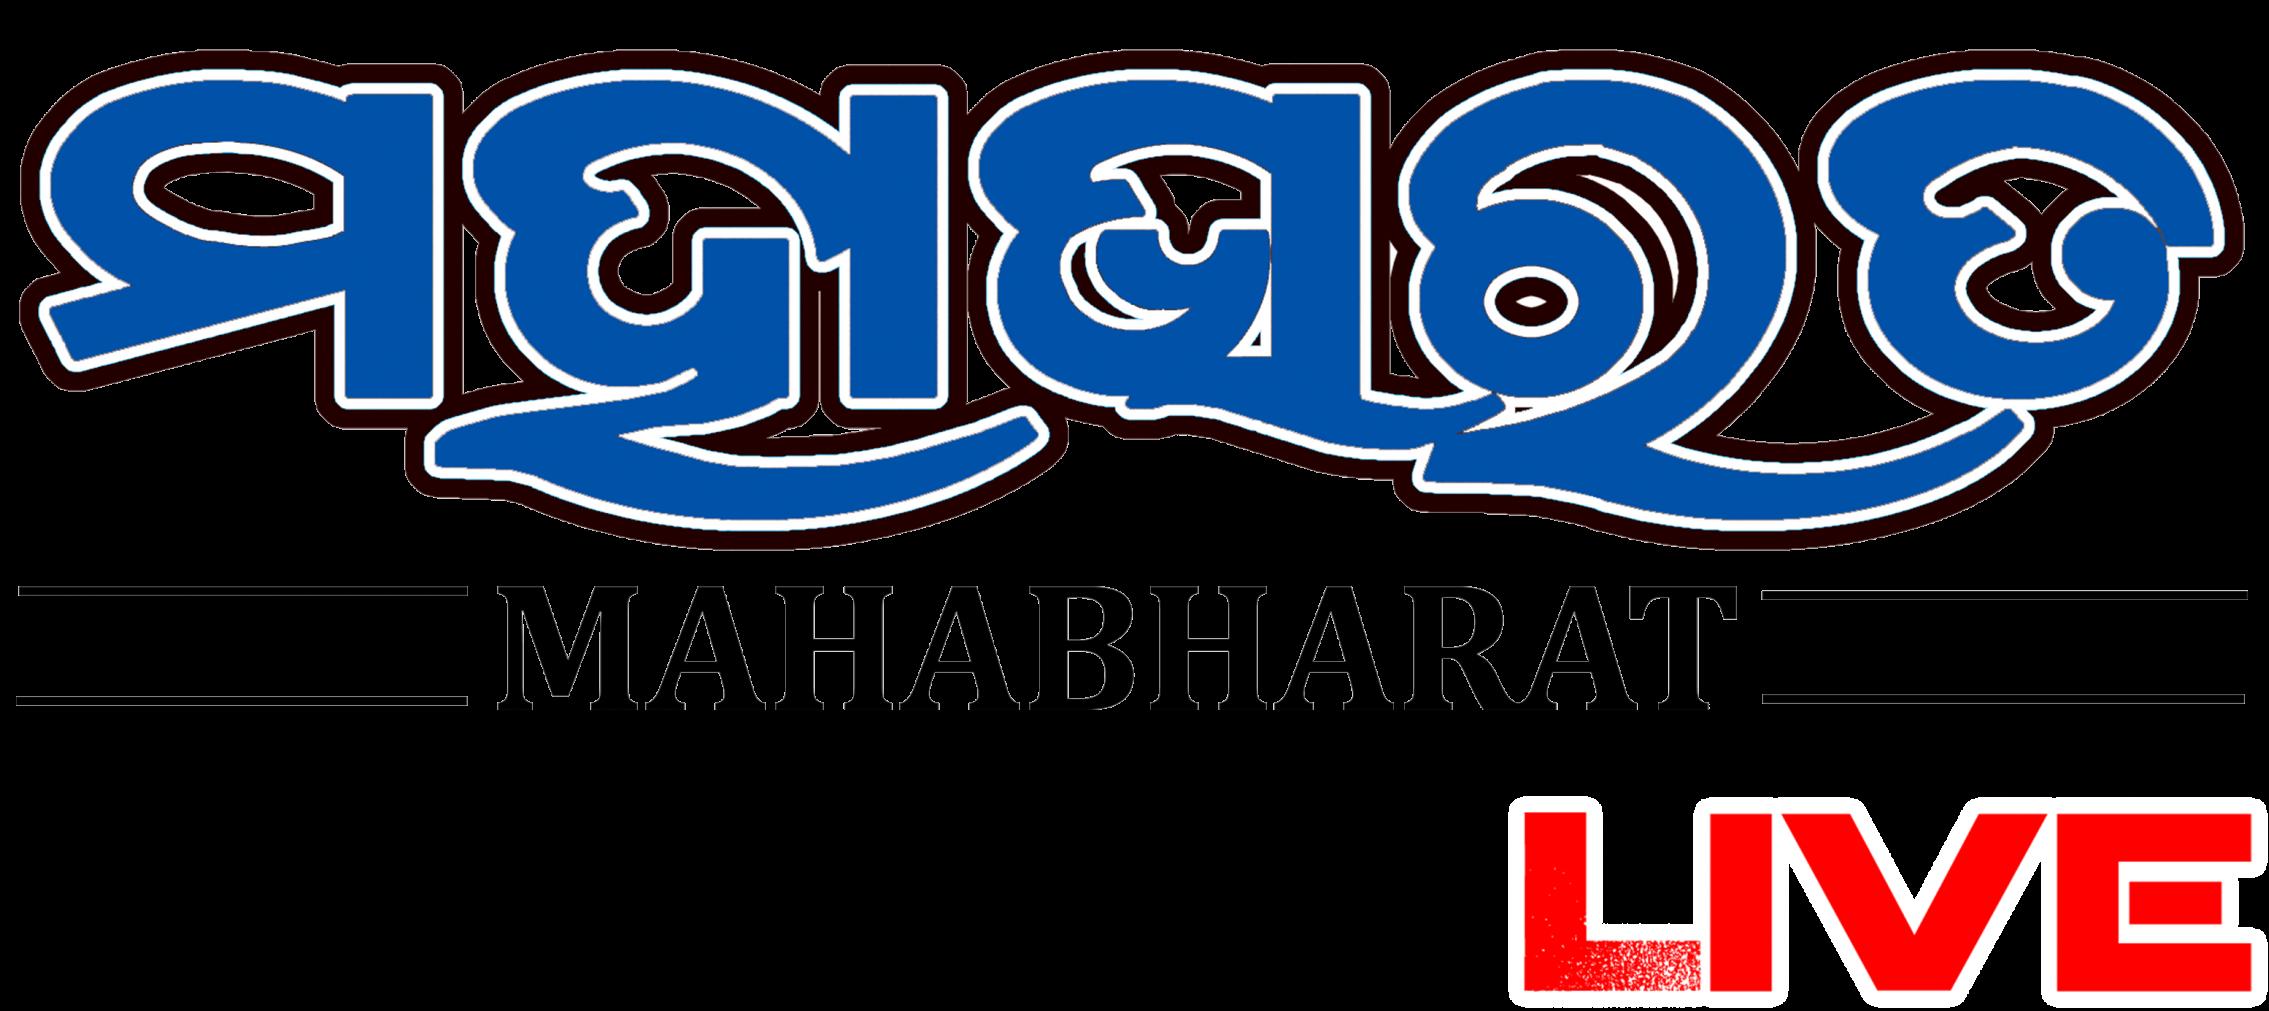 Mahabharata News